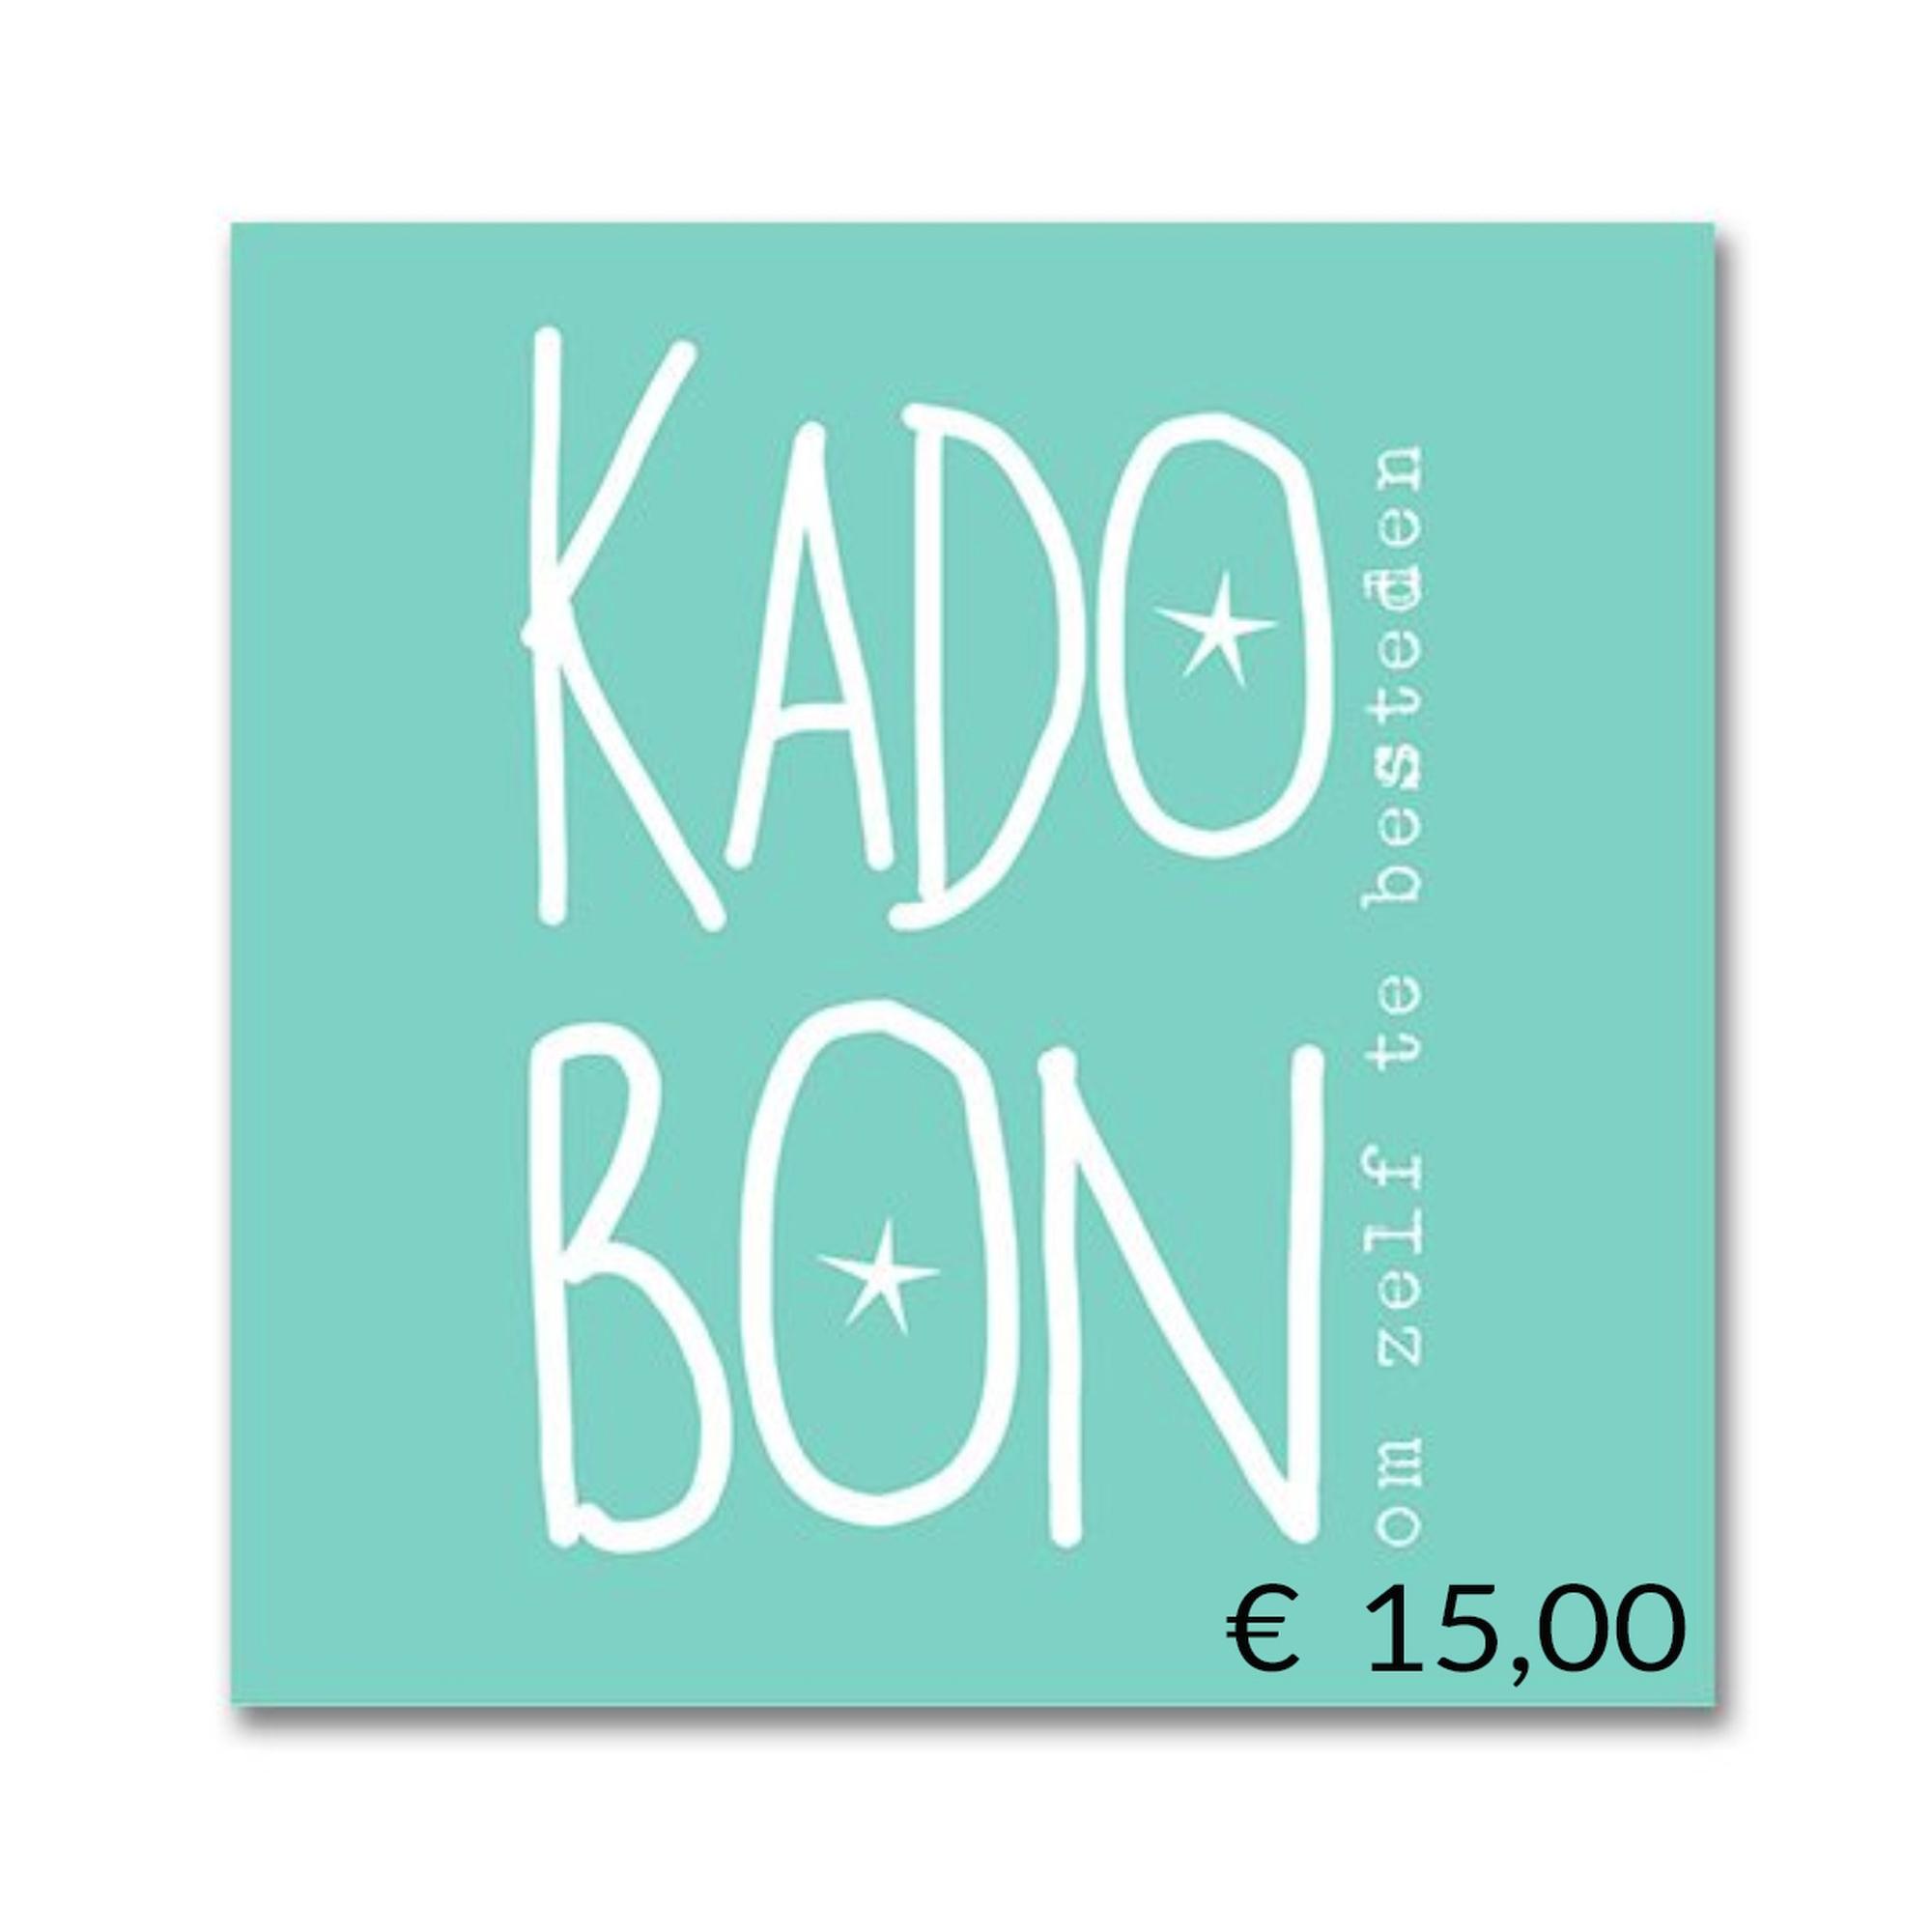 Steenwijk Schoenmode Kadobon Eur 15,00